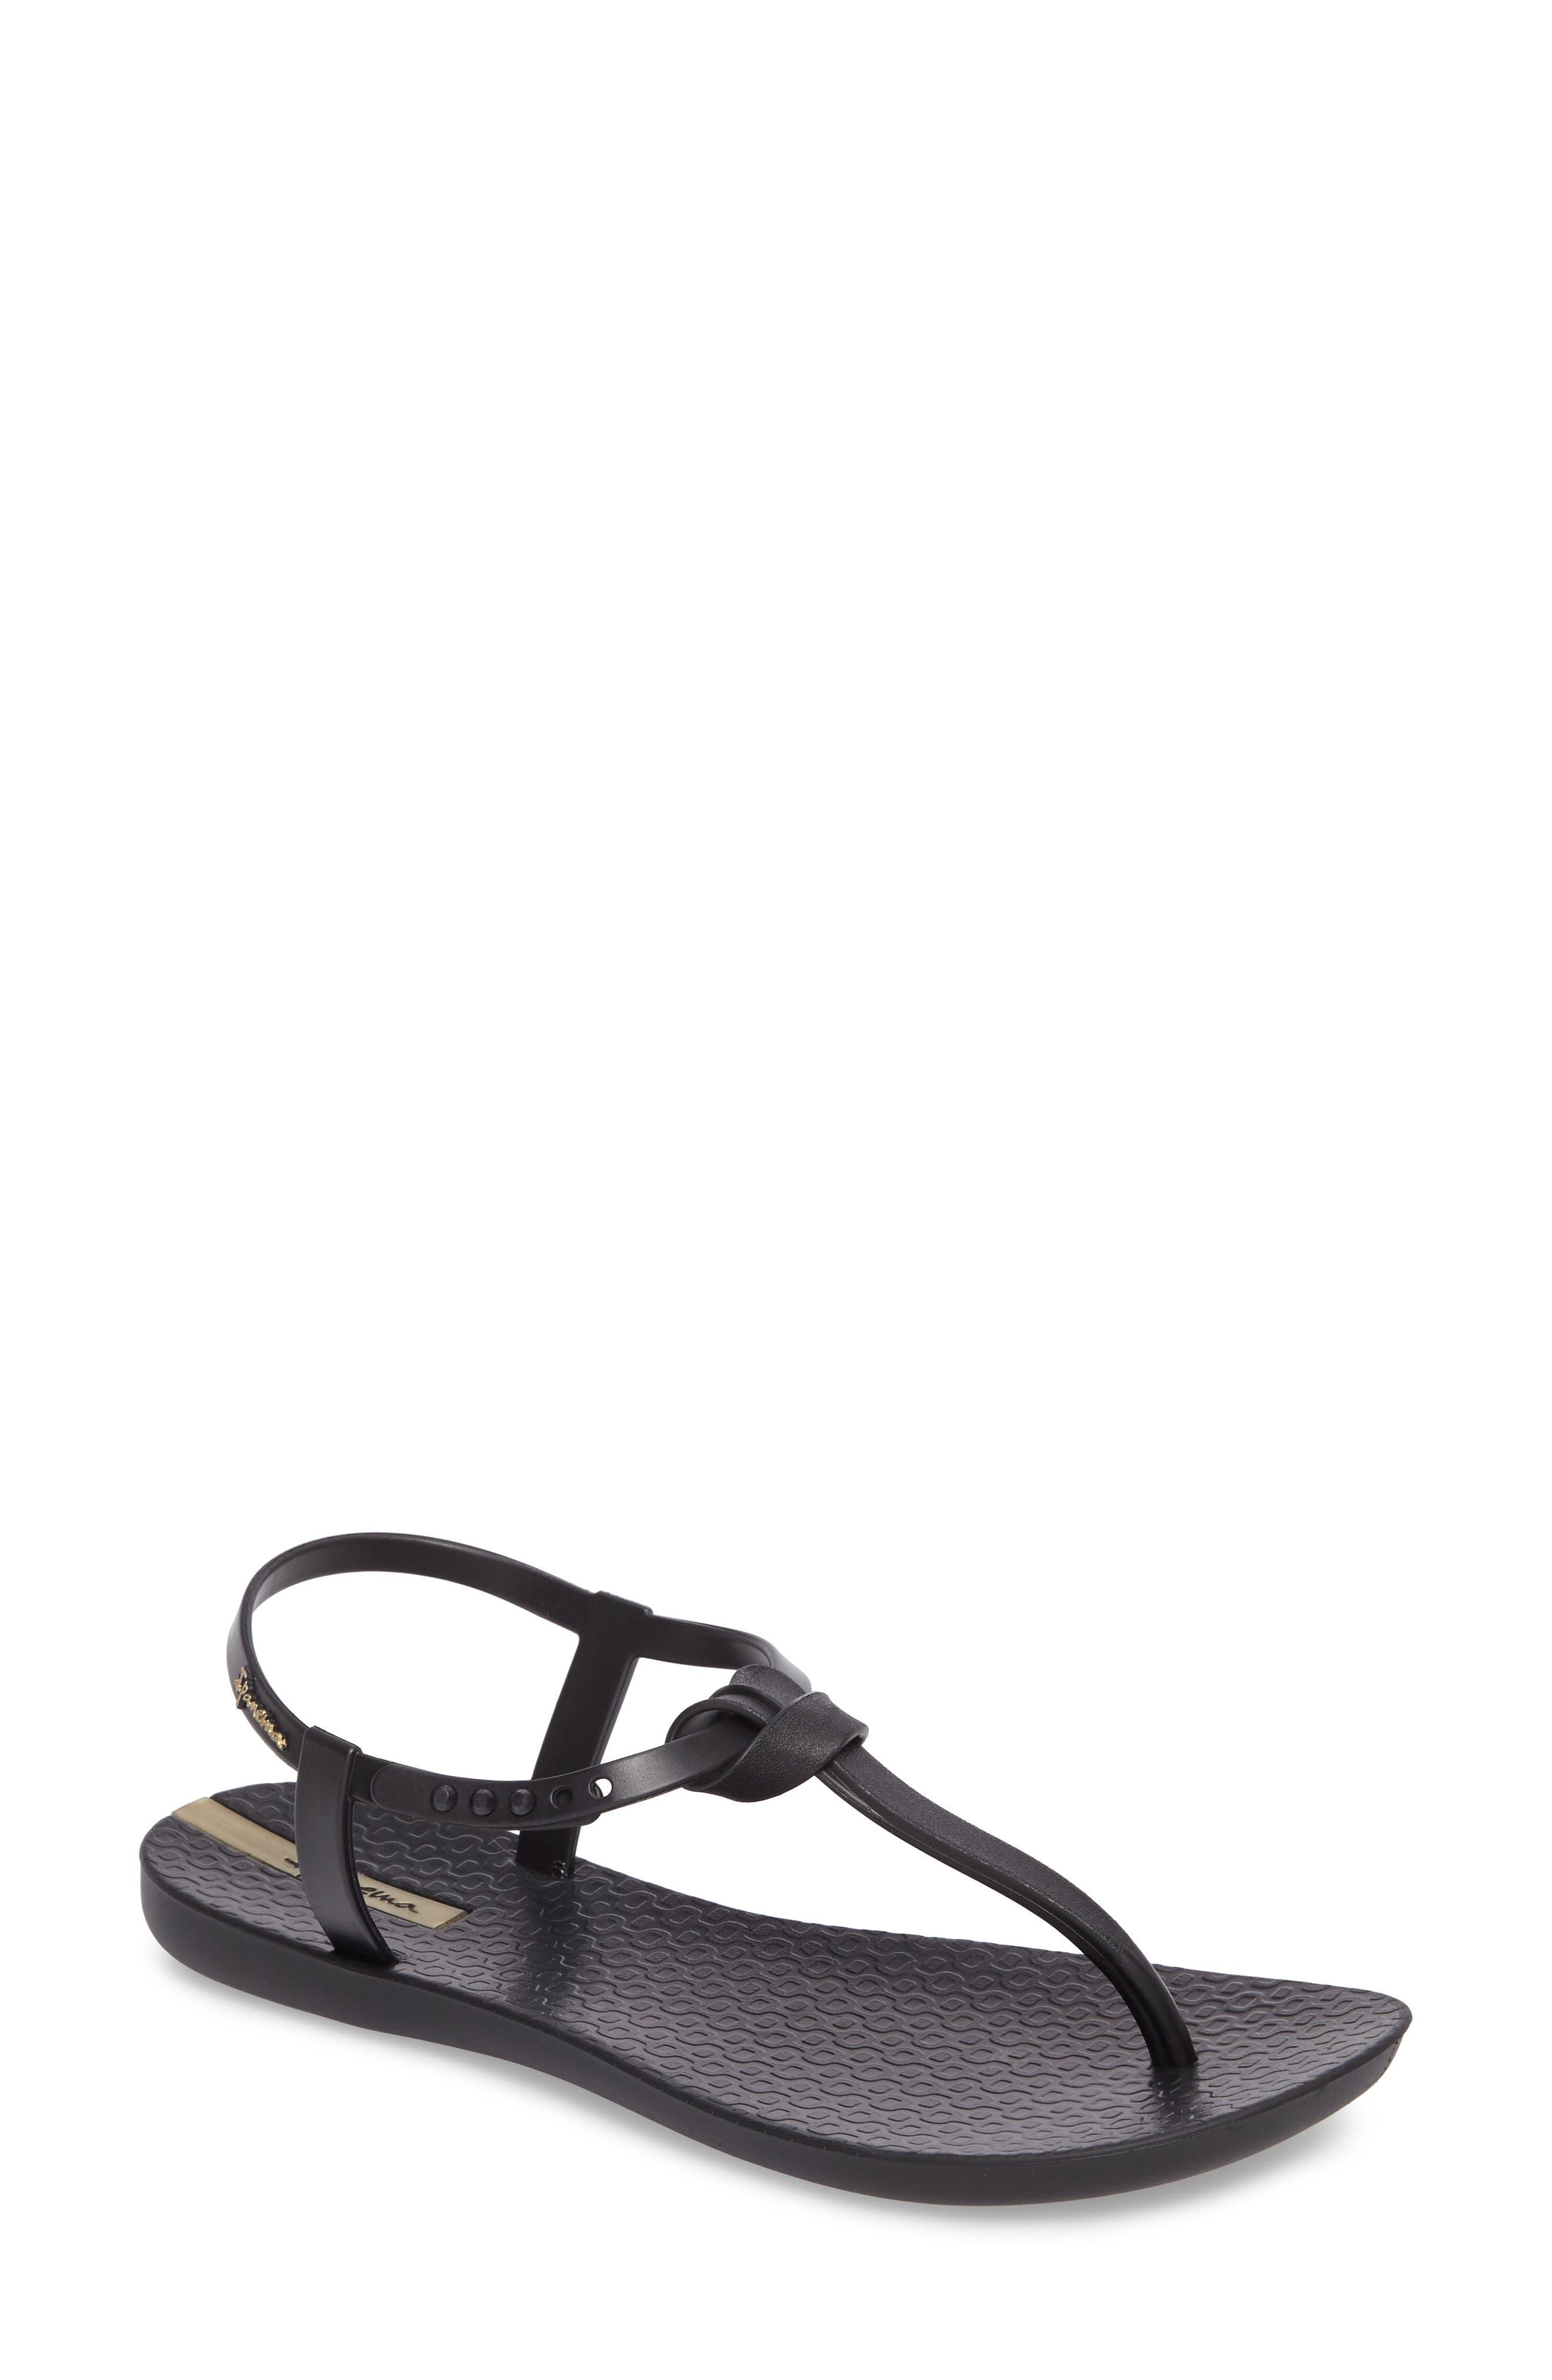 IPANEMA Women'S Ellie Thong Sandals in Black/ Black